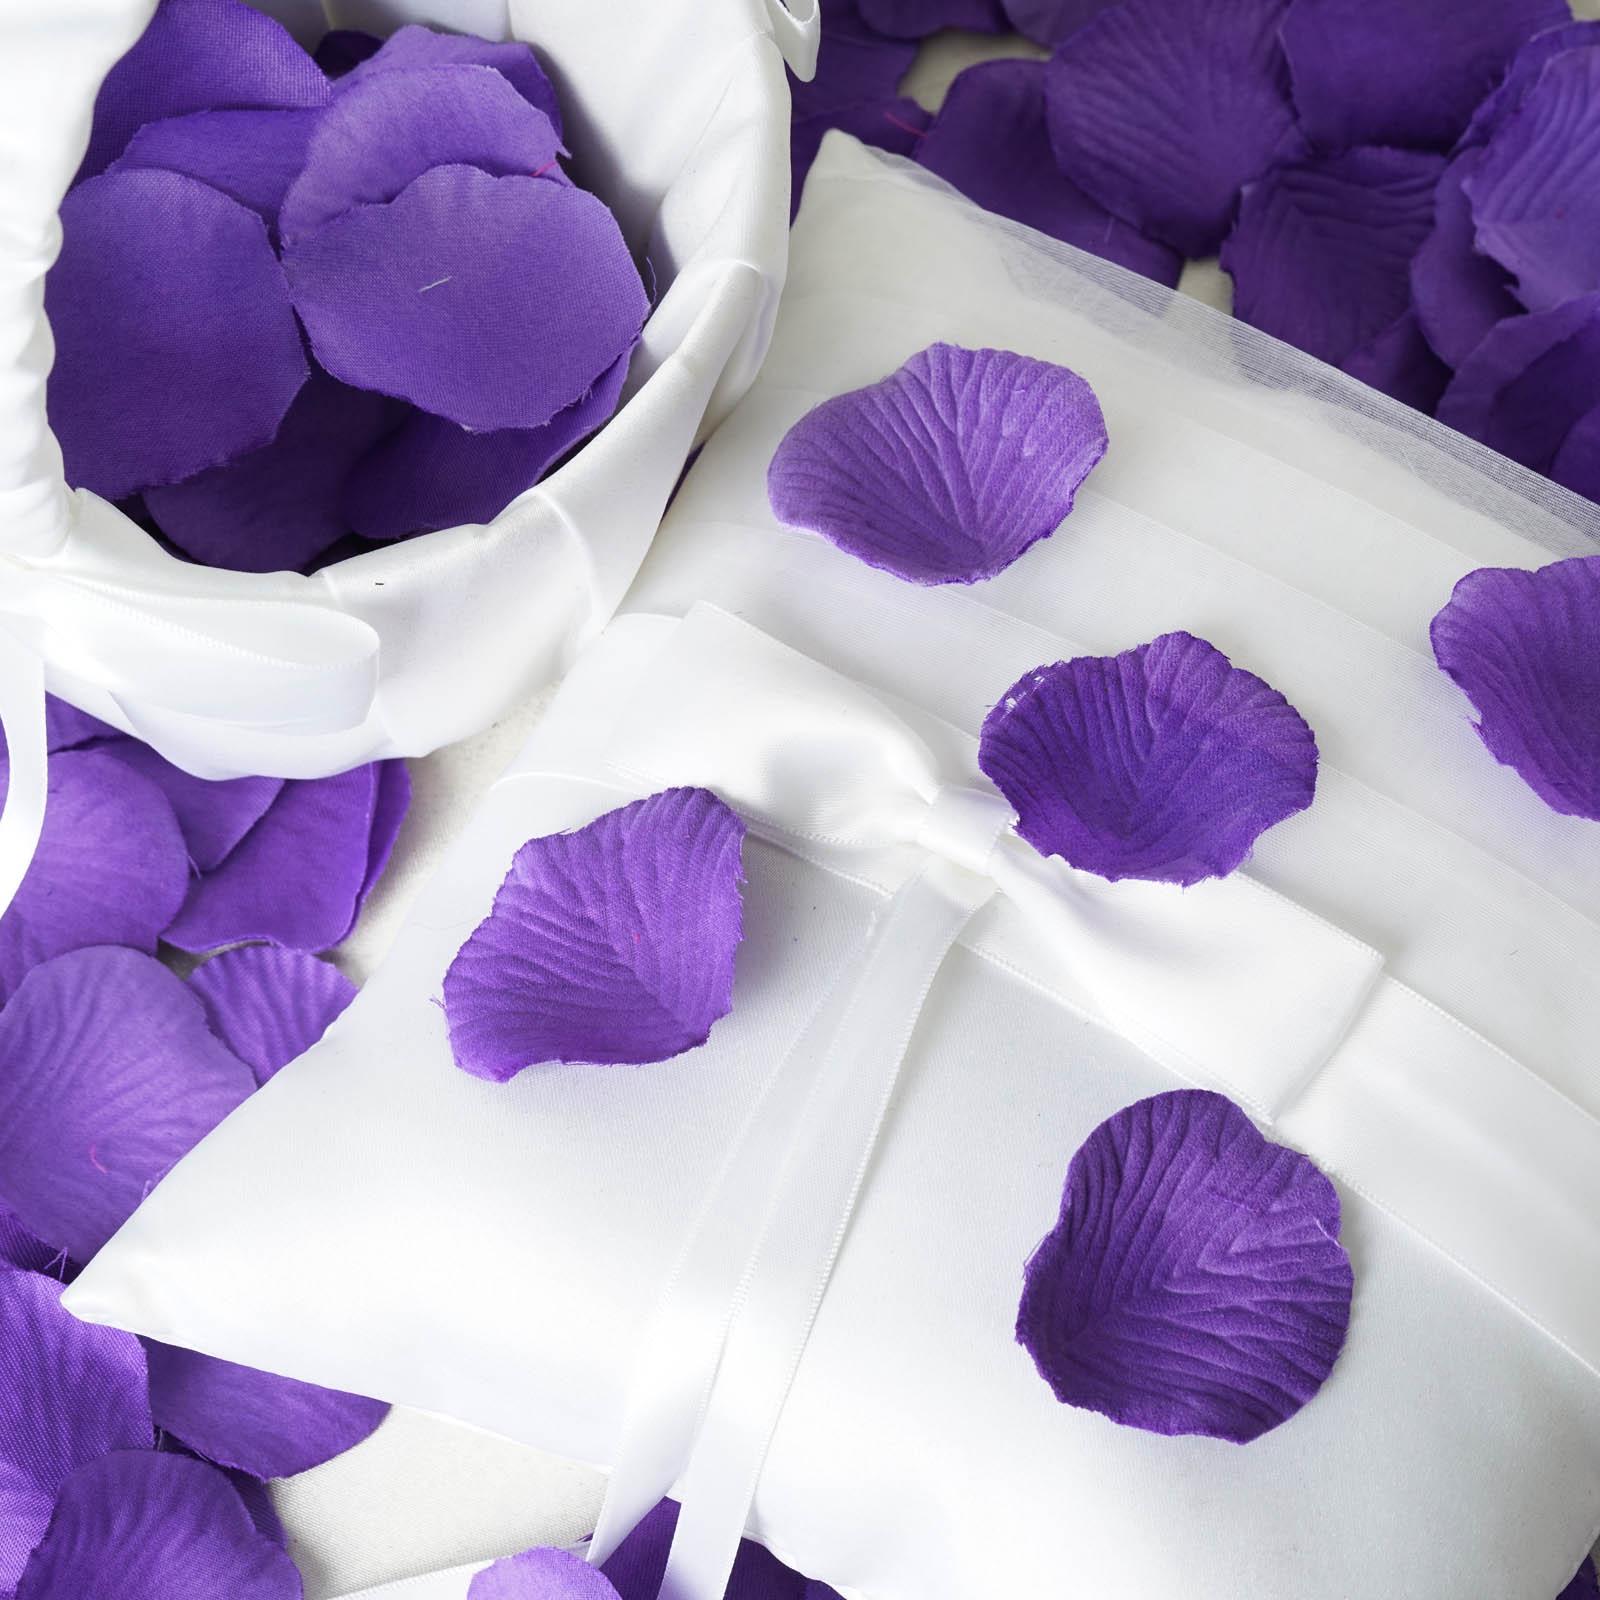 4000 Silk Rose Petals Wedding Decorations Favors Wholesale Bulk ...